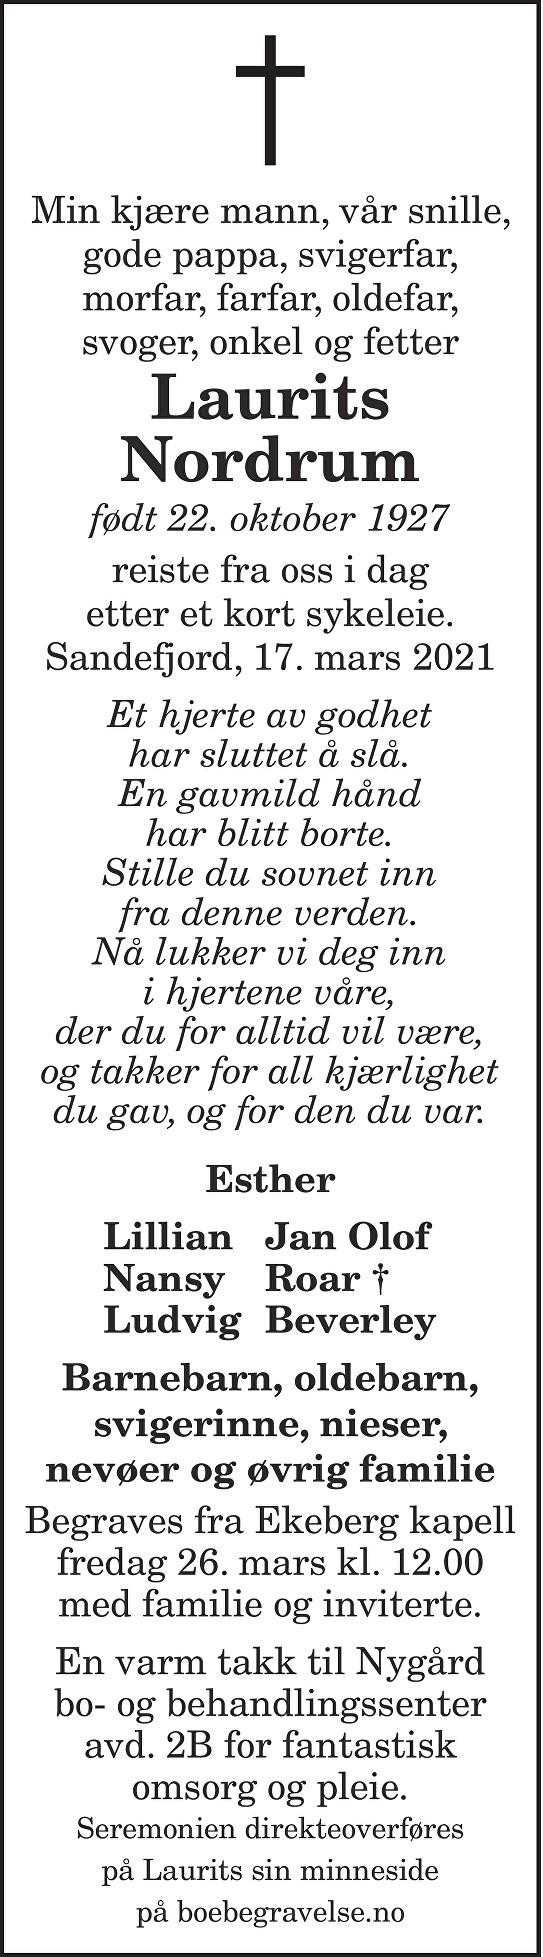 Laurits Nordrum Dødsannonse